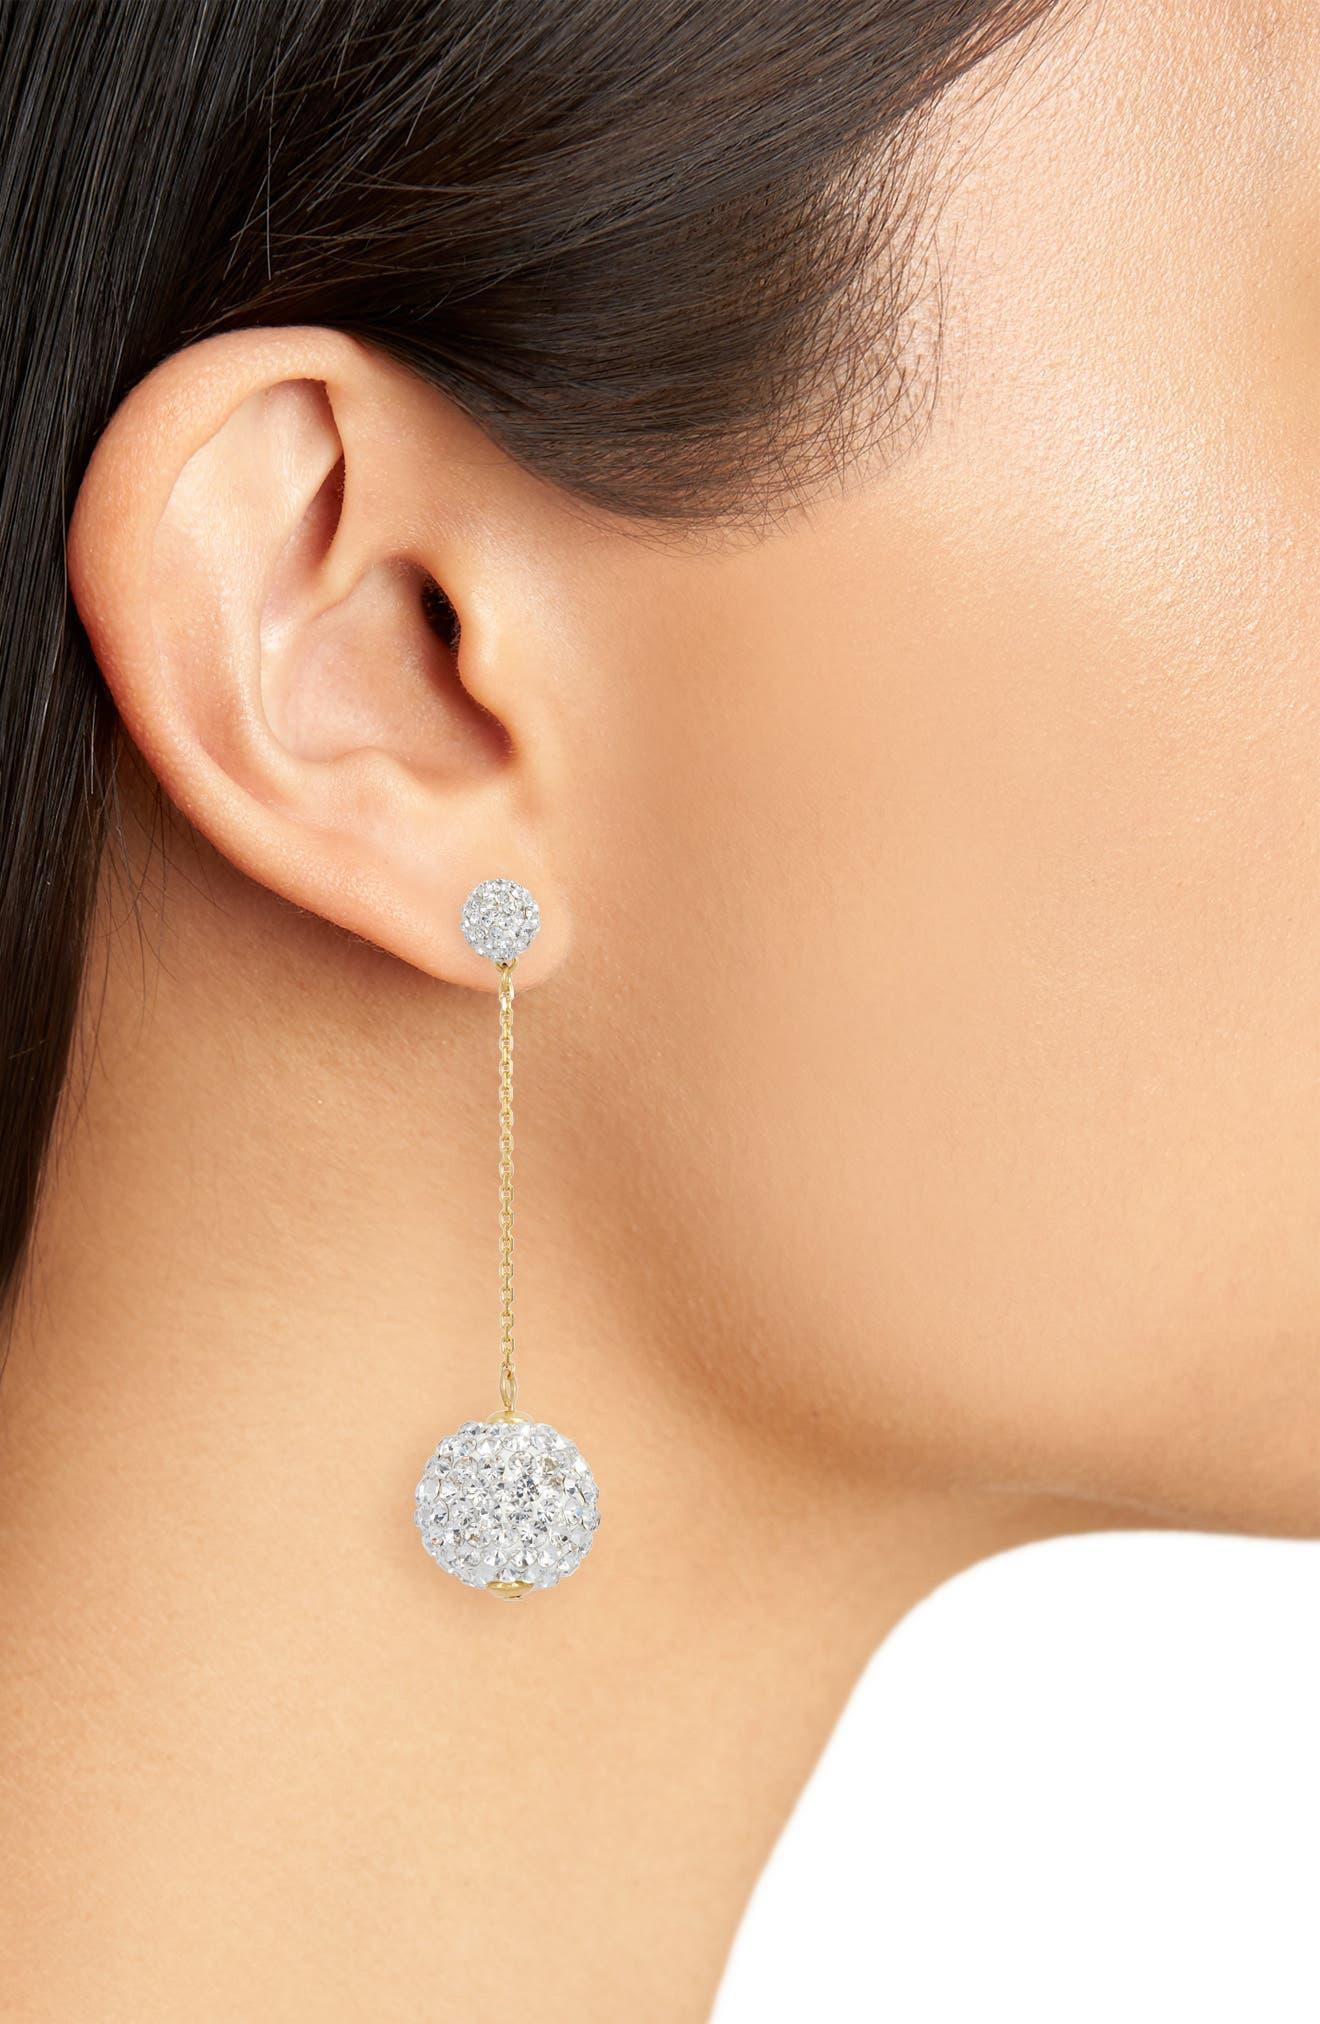 razzle dazzle linear earrings,                             Alternate thumbnail 2, color,                             CLEAR/ WORN GOLD